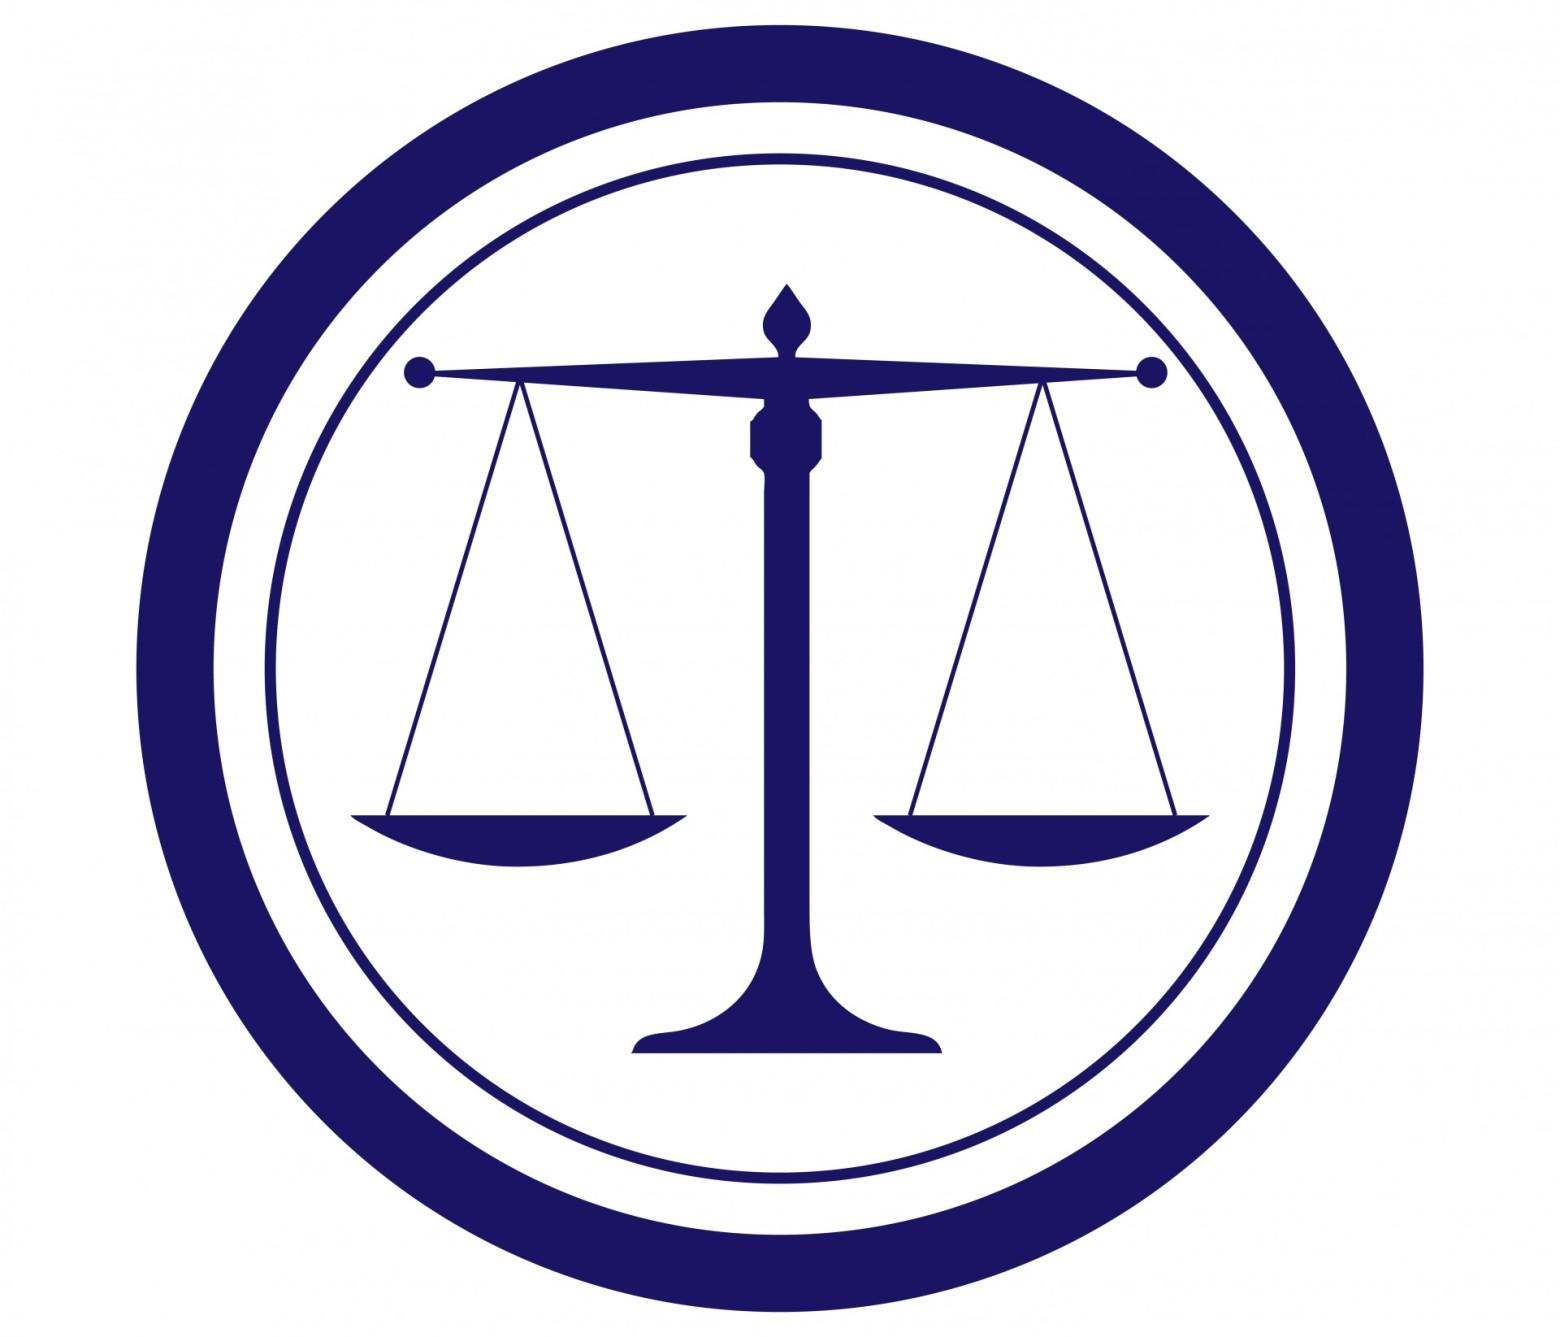 Clipart logos symboles lois justice quilibre images gratuites et libres de droits - Symbole de la perseverance ...